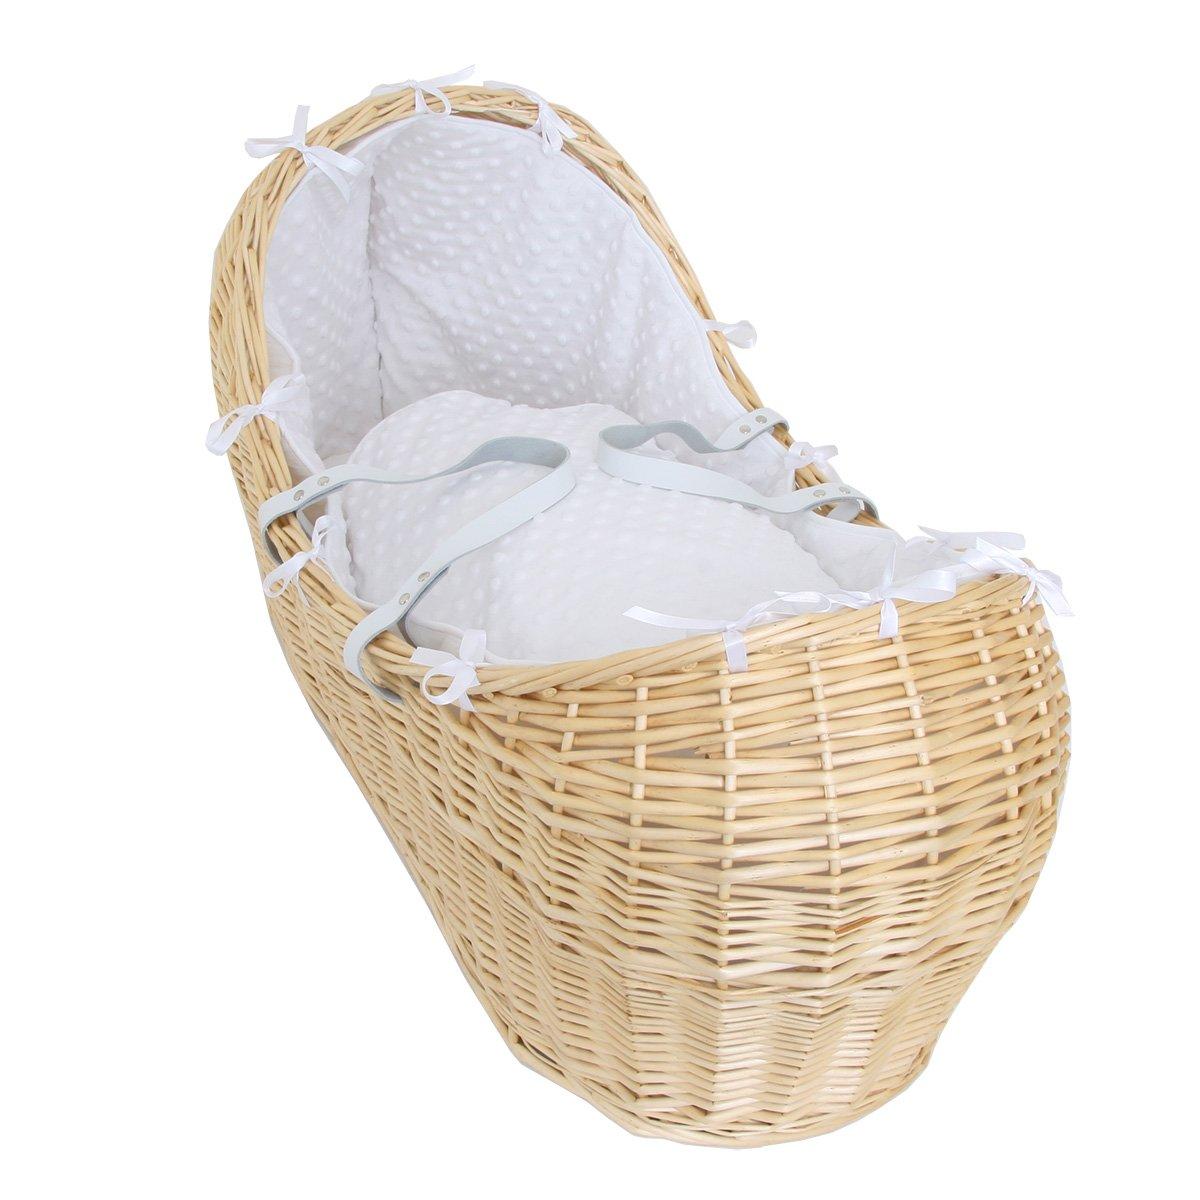 Isabella Alicia Popcorn Izzy Pod Natural Moses Basket (White) BUIAMBPODNATFAPOPWHT